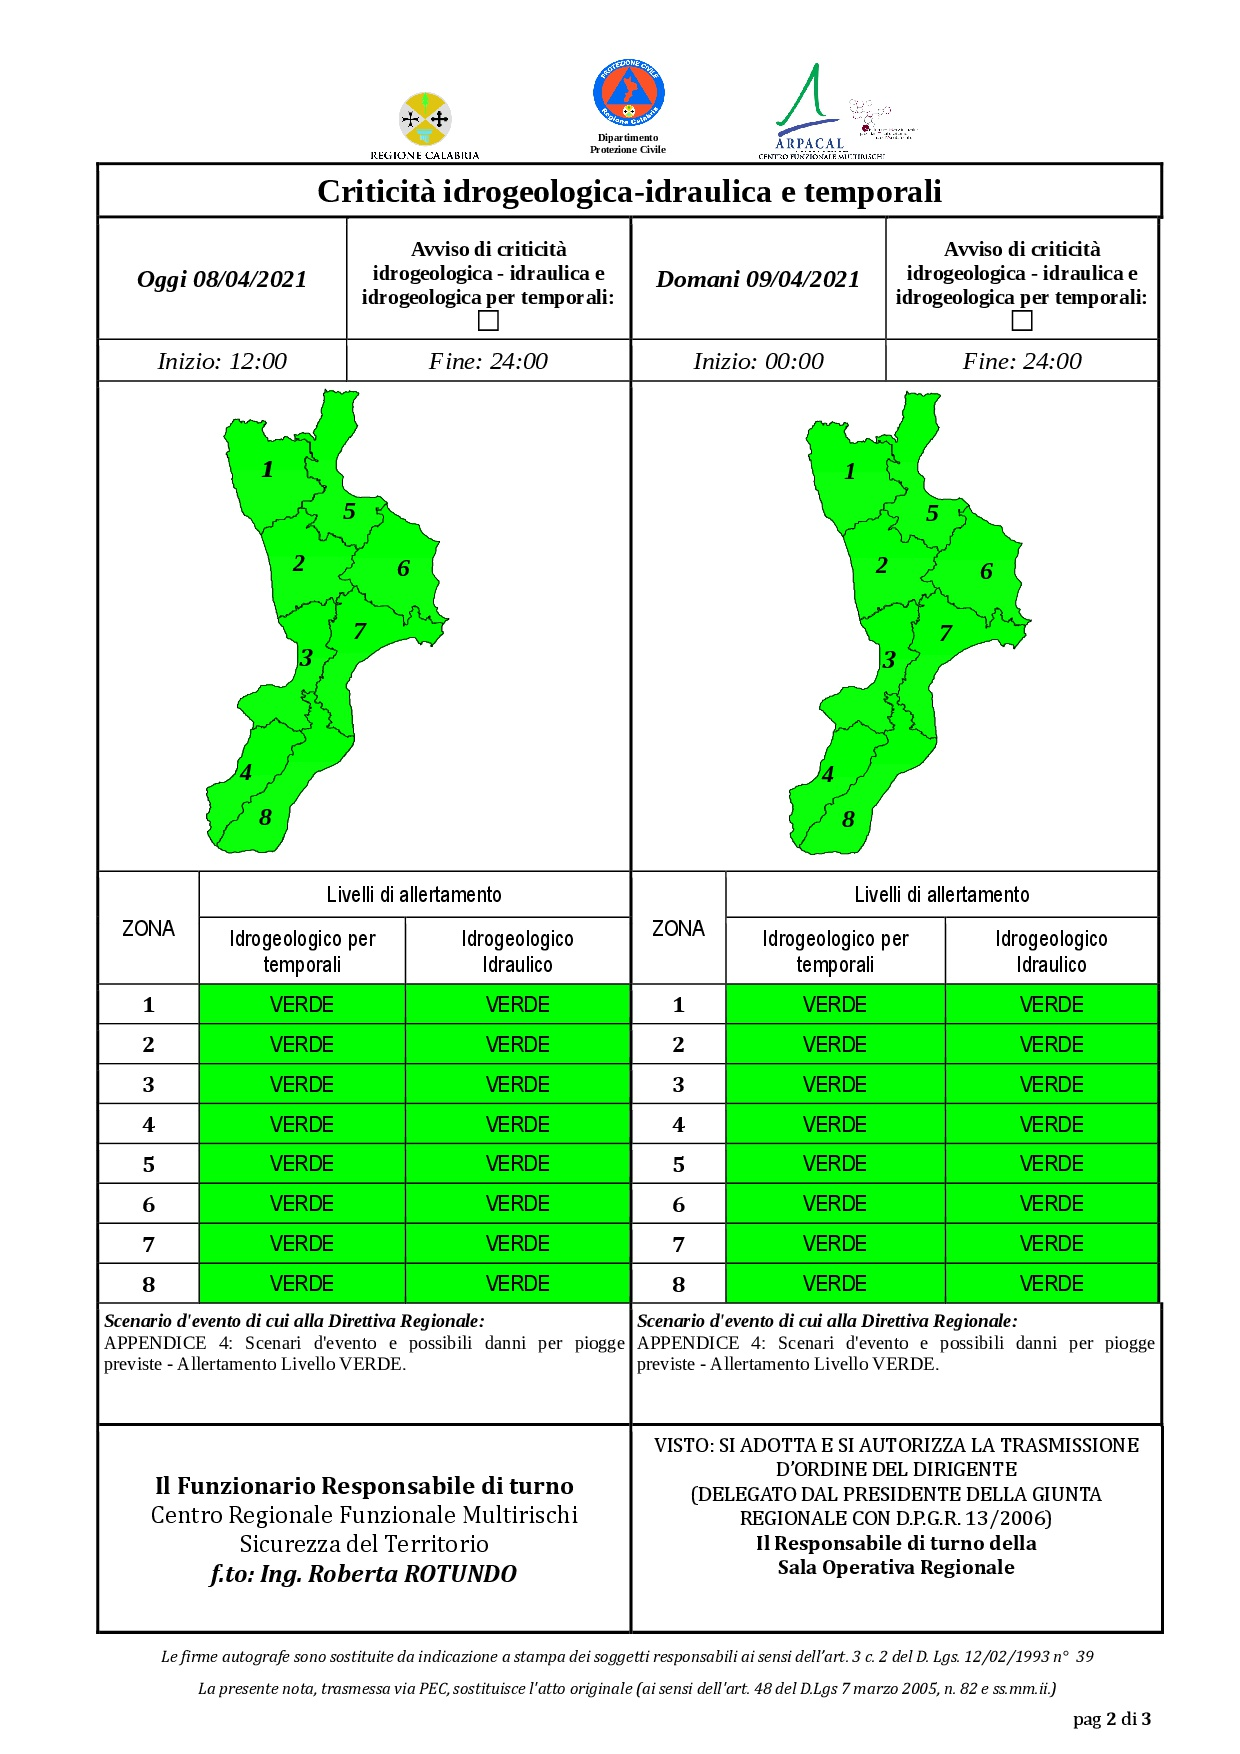 Criticità idrogeologica-idraulica e temporali in Calabria 08-04-2021